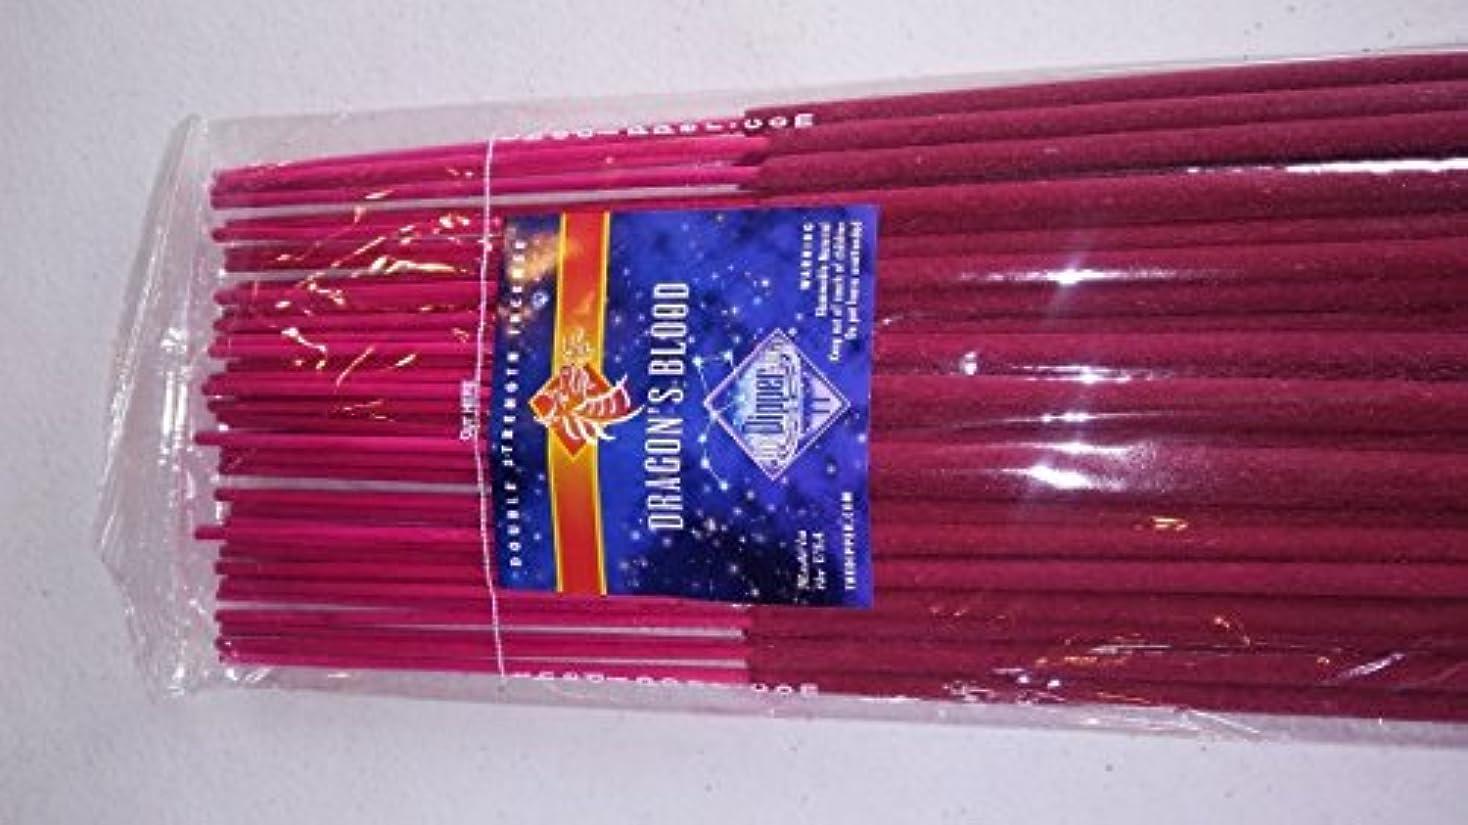 The Dipper Dragon 's Blood 19インチジャンボIncense Sticks – 50 Sticks